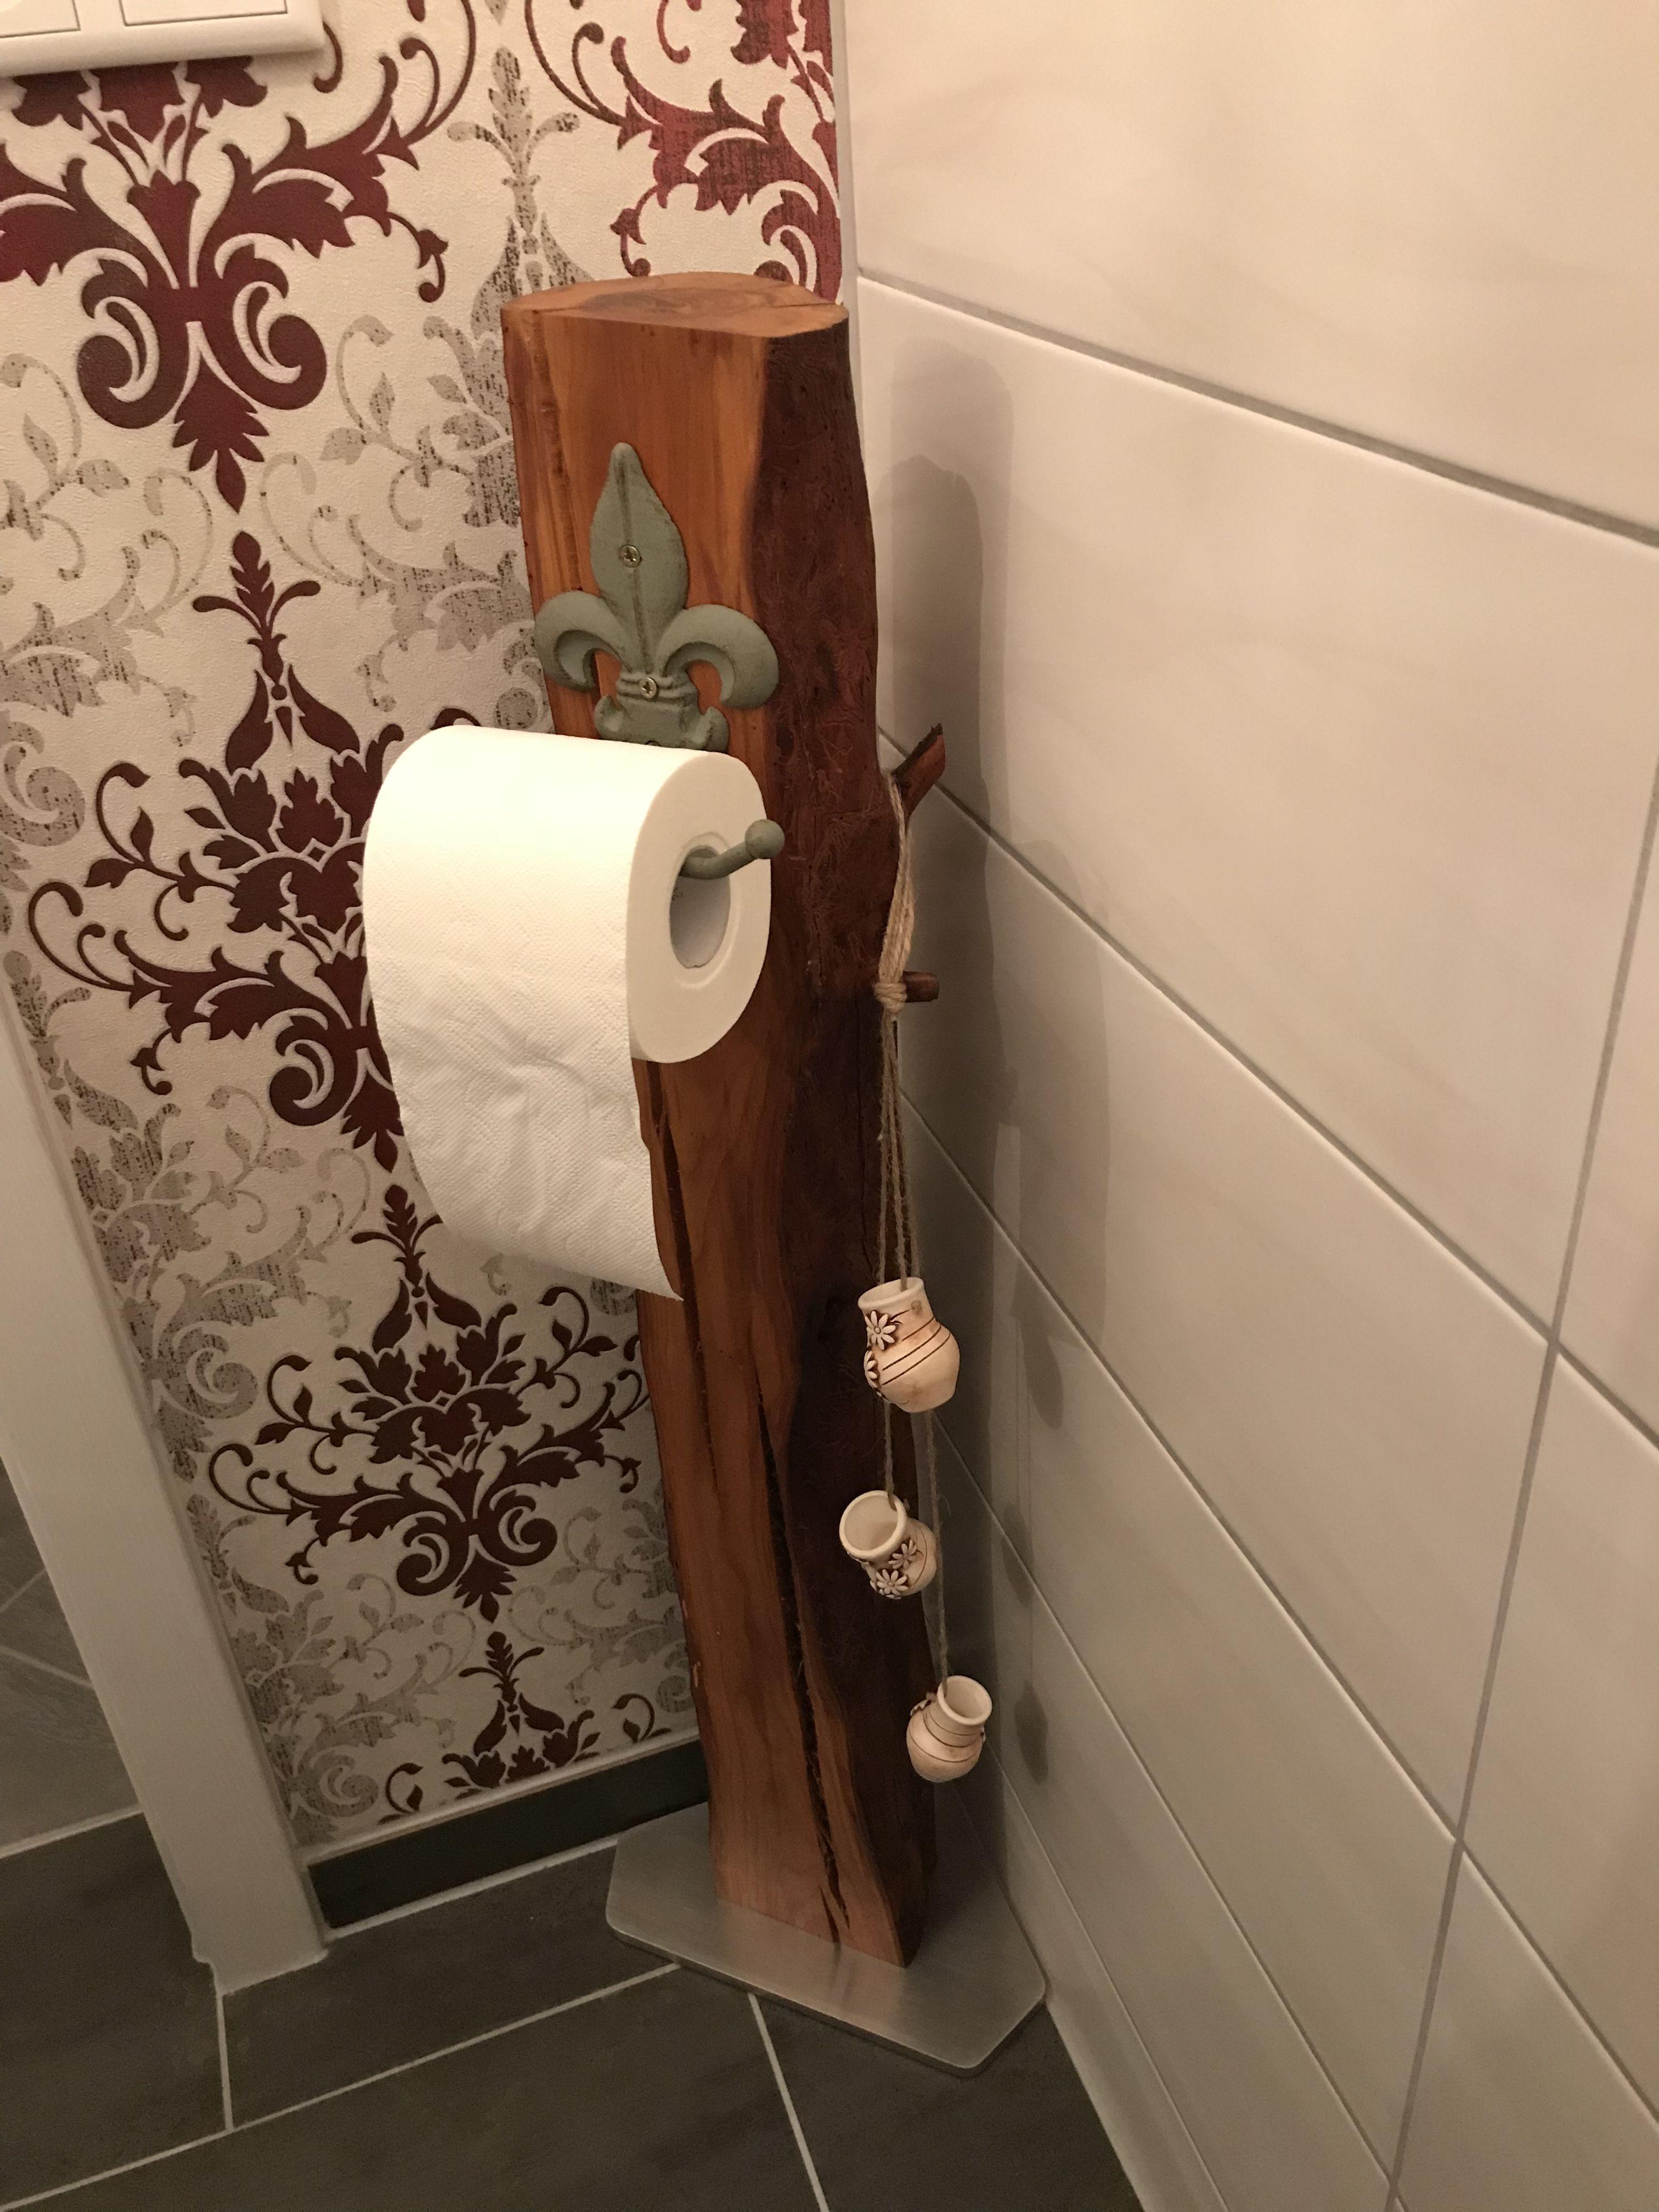 Klopapier Rollen Halter Wc Wc Papier Klopapier Badezimmer Renovieren